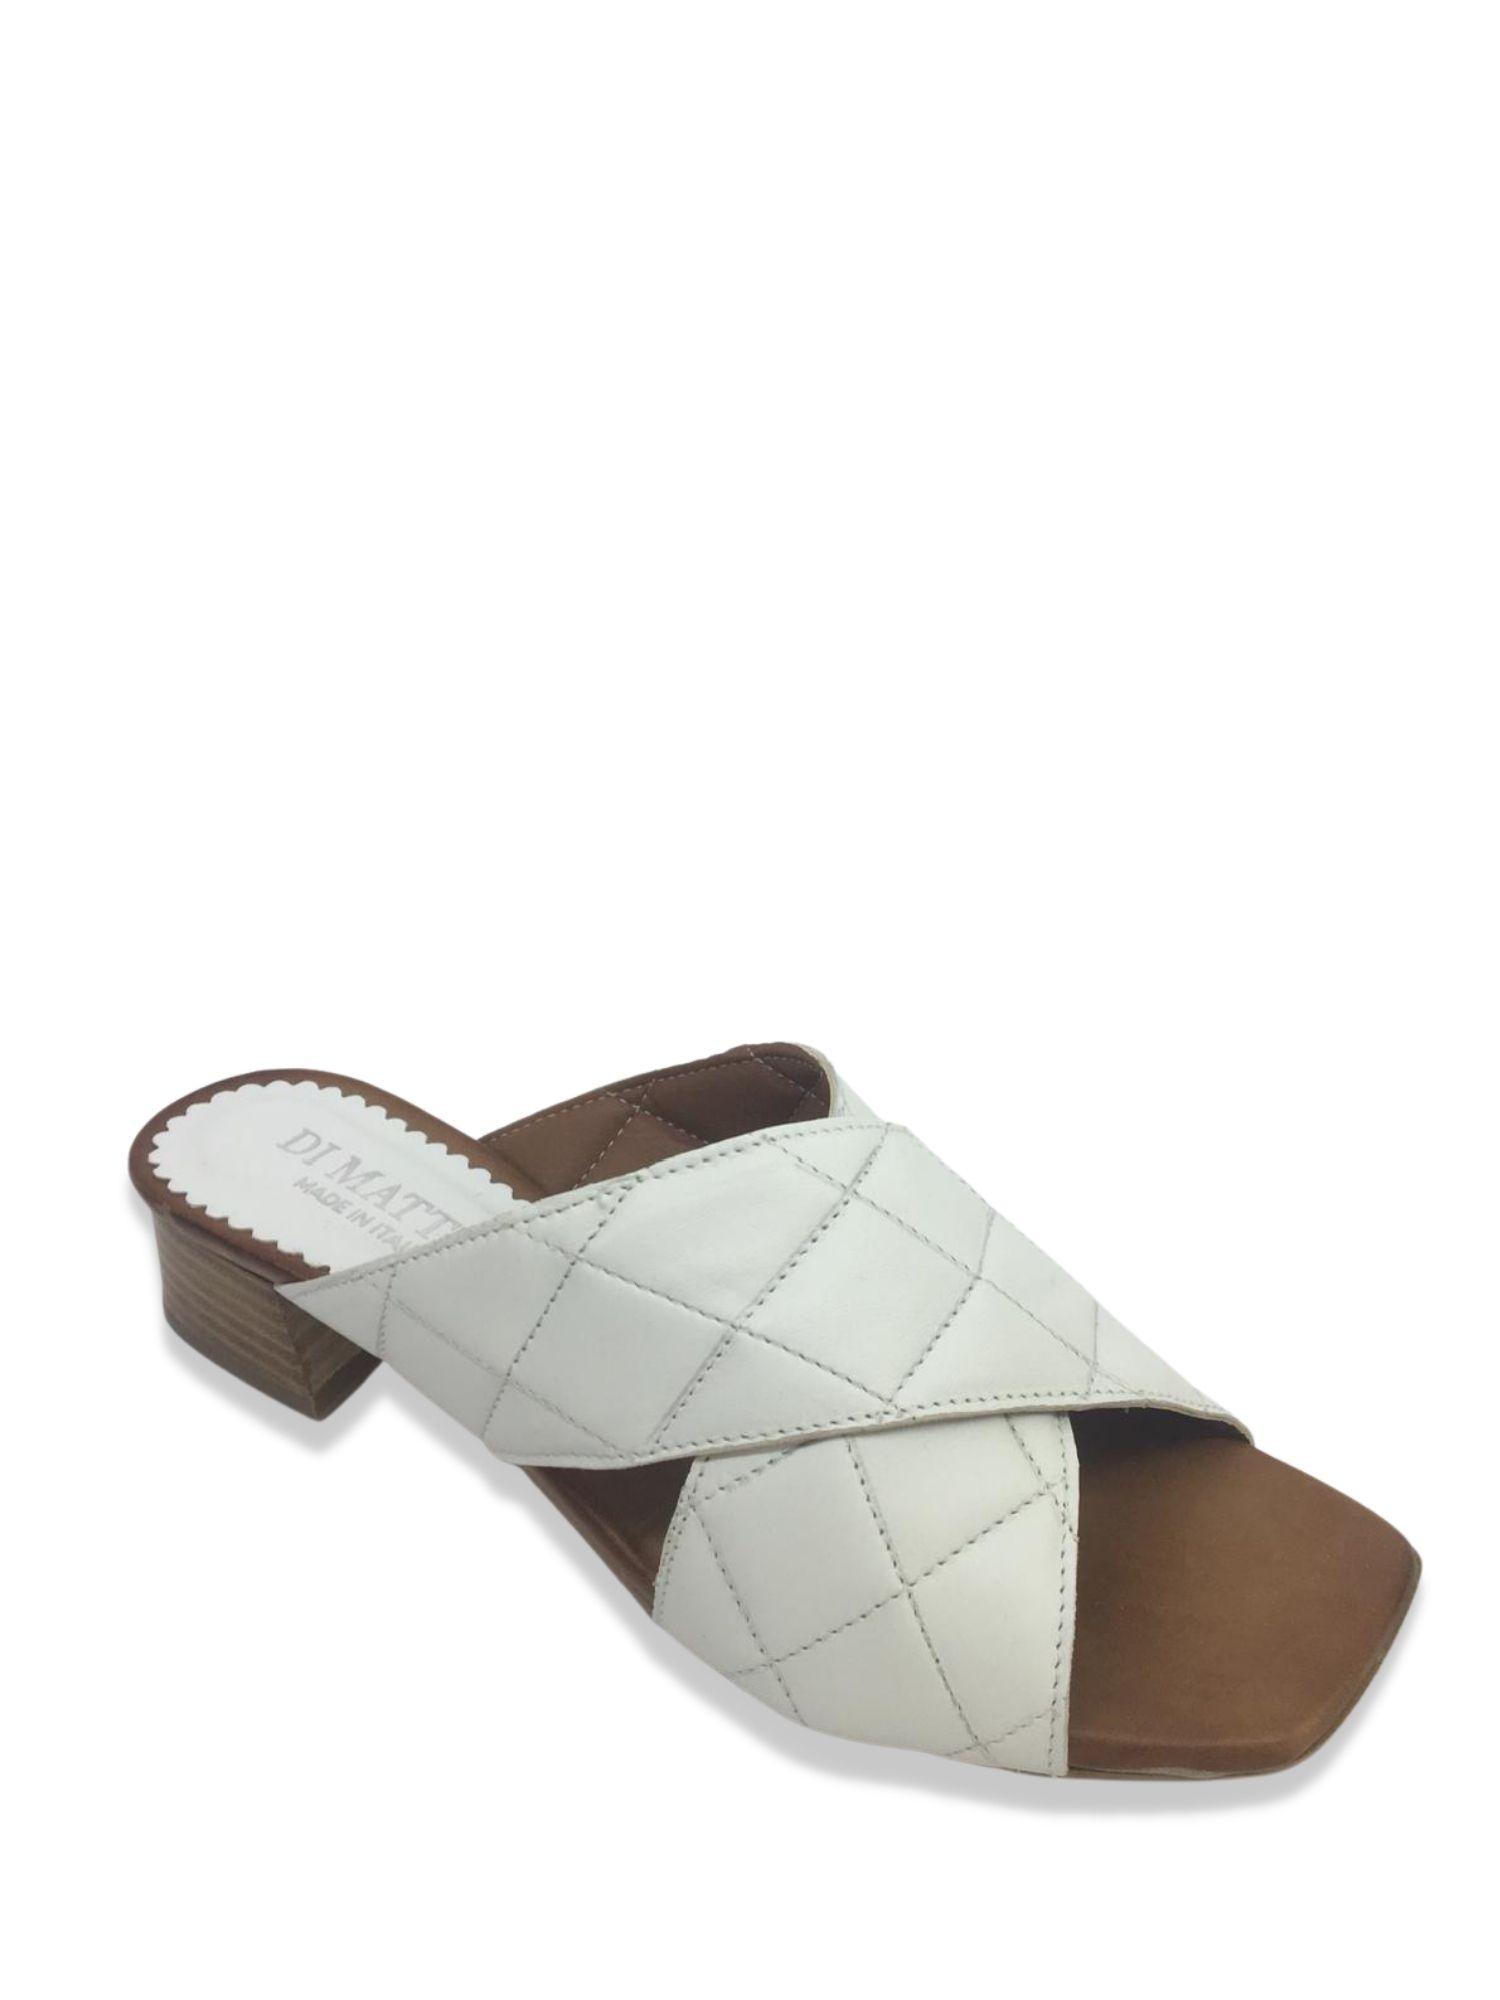 Sandalo scalzato Made in Italy 506 Bianco laterale